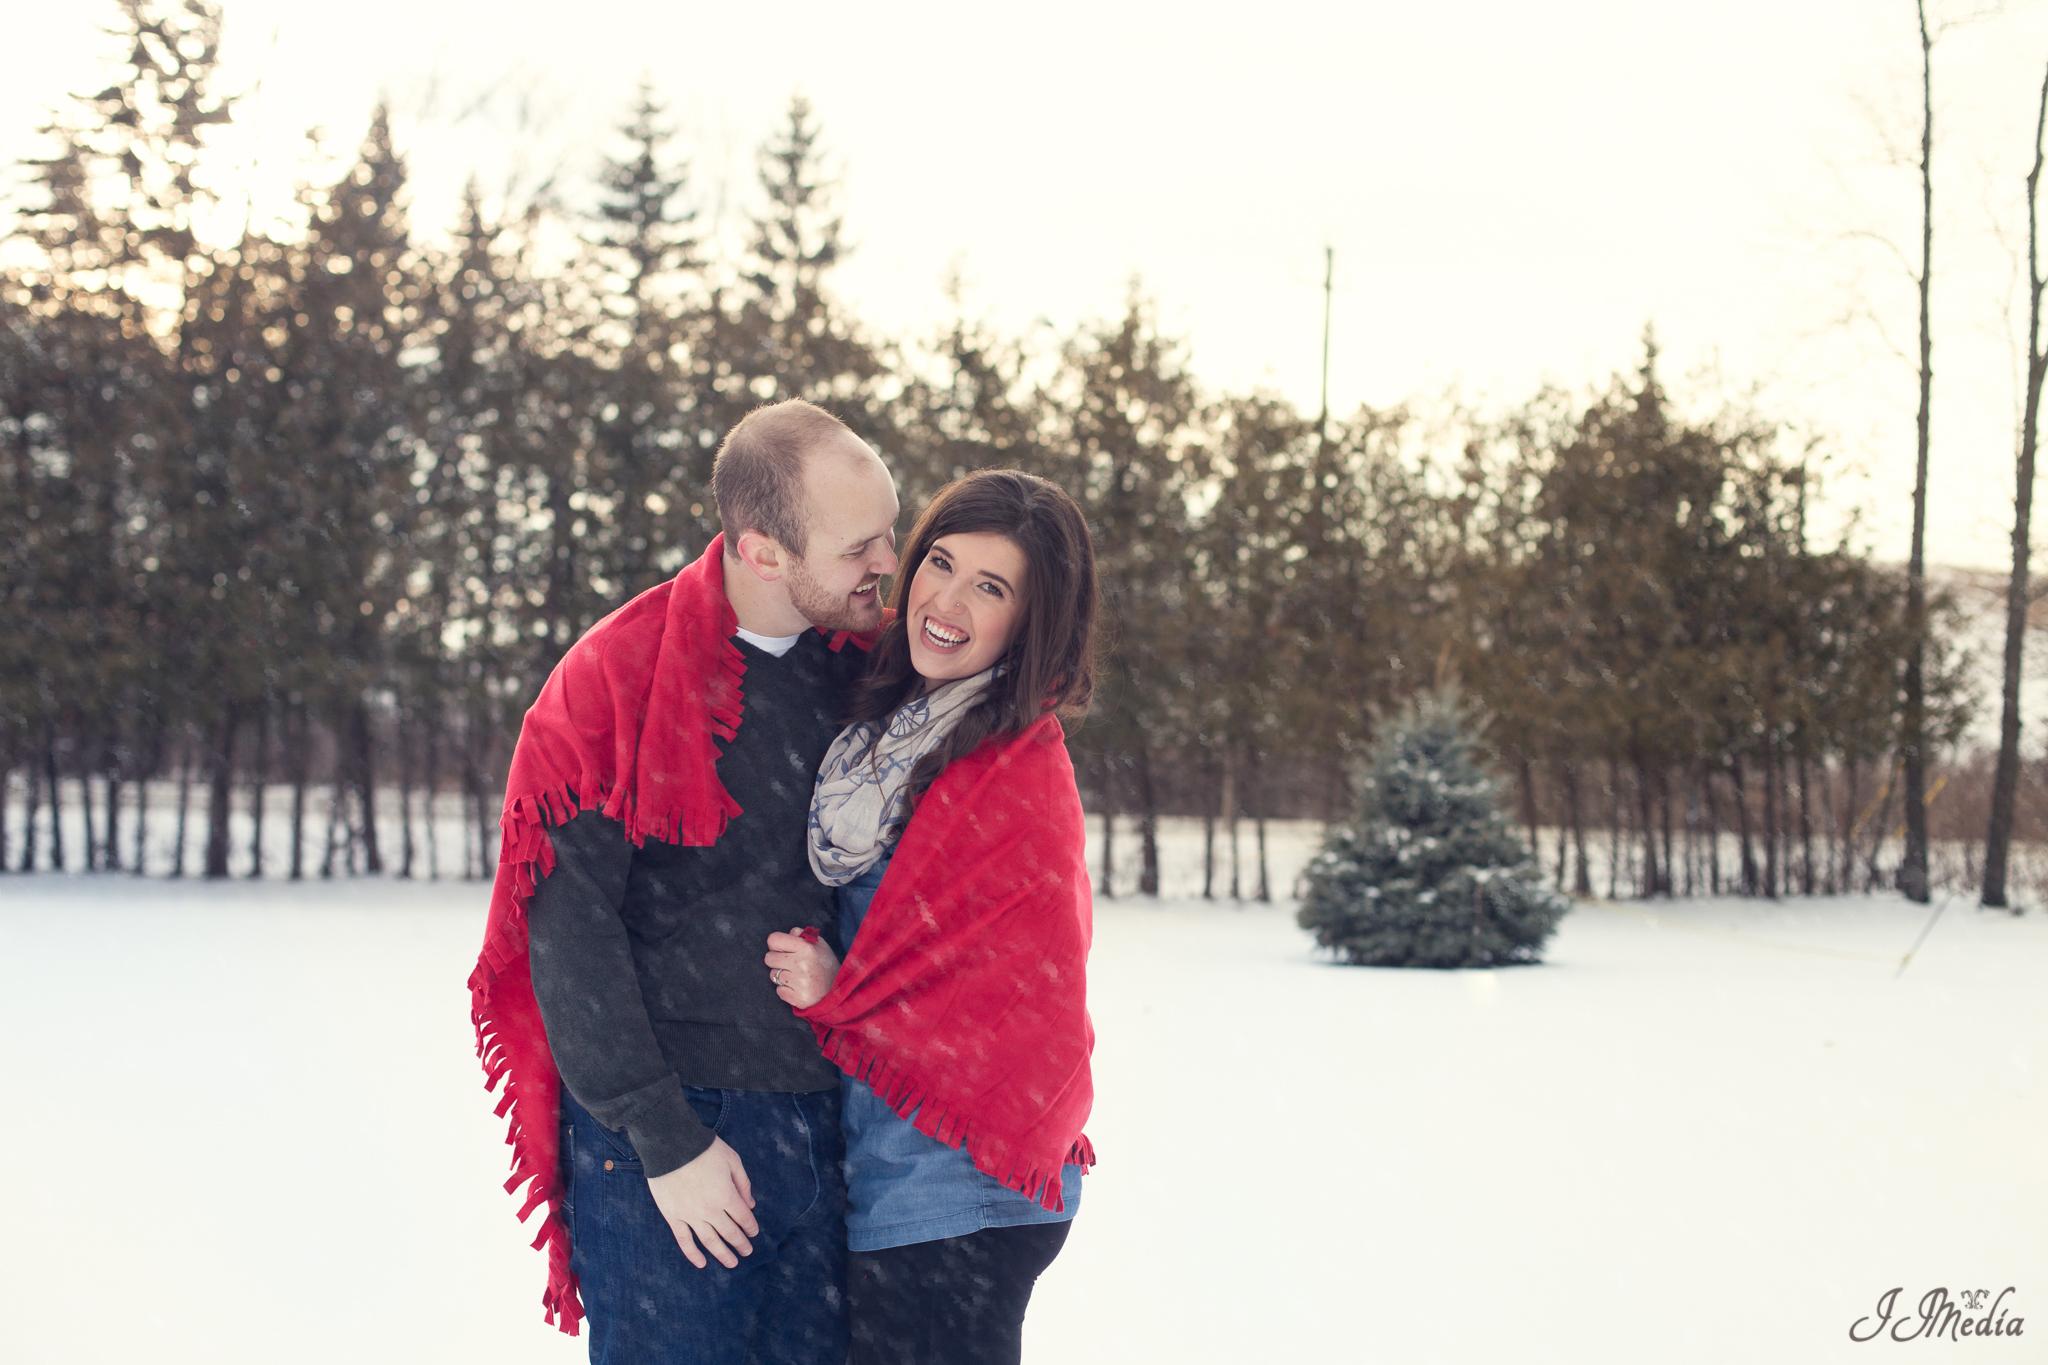 Winter-Engagement-Photos-JJMedia-11